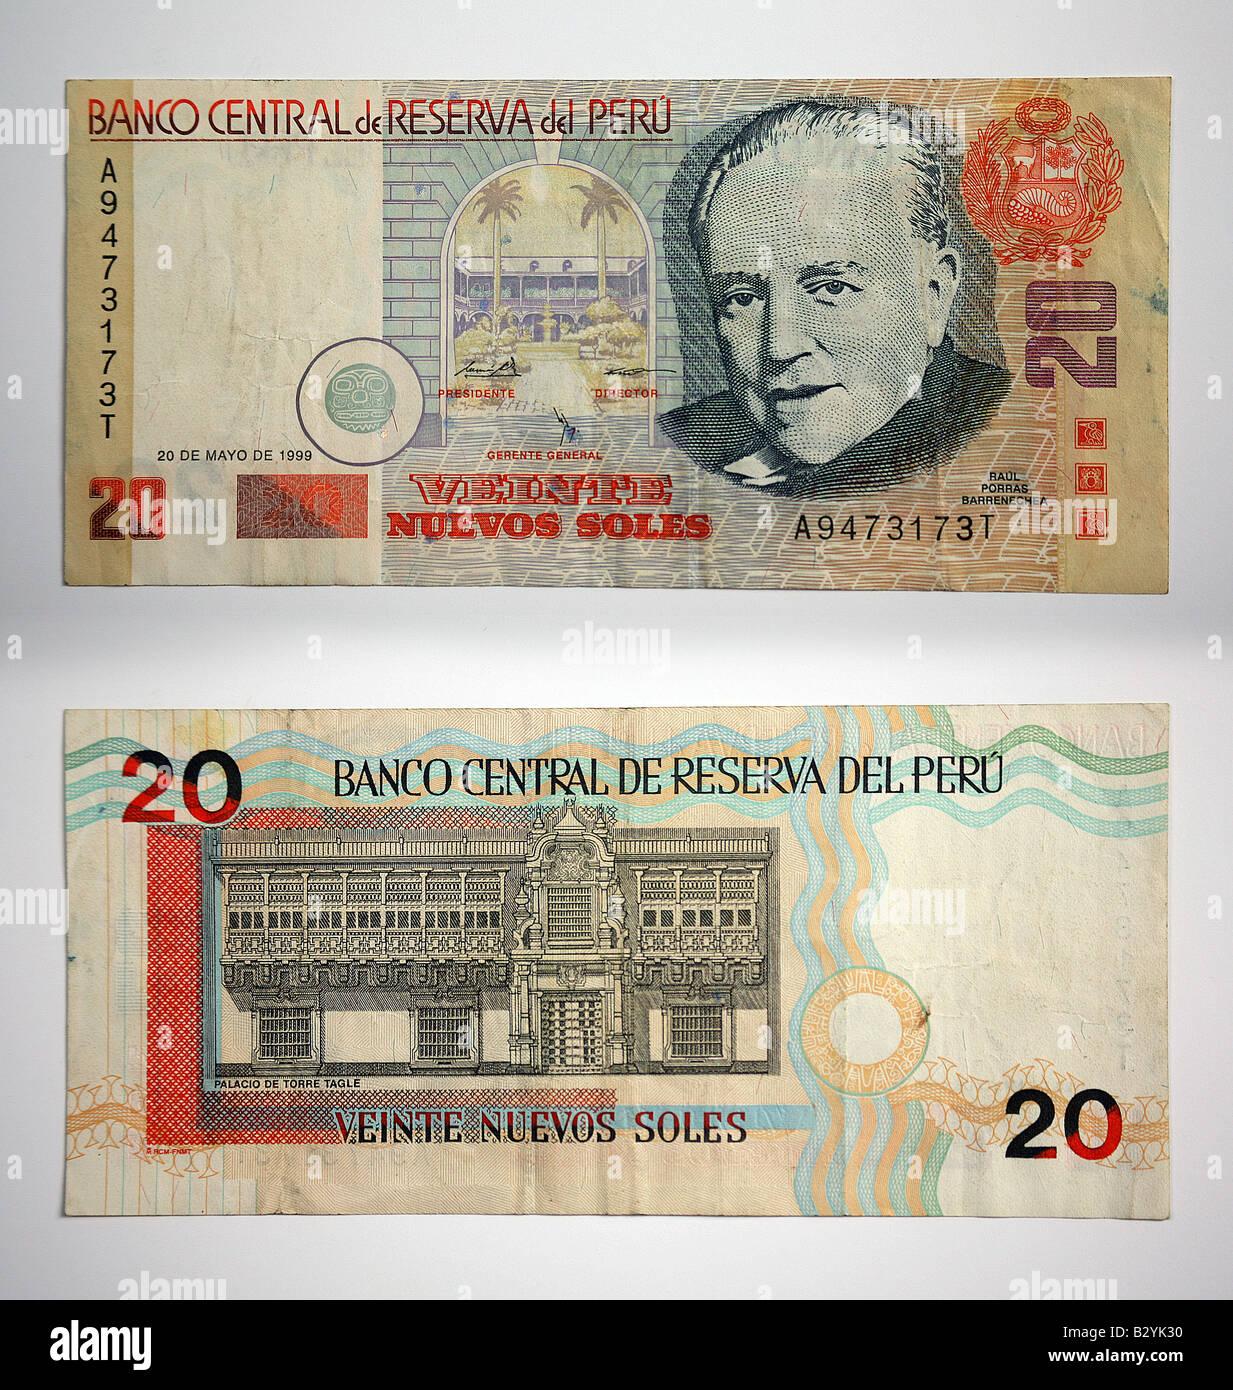 Peru geld viente nuevos soles stockfoto bild 19047364 alamy peru geld viente nuevos soles thecheapjerseys Images